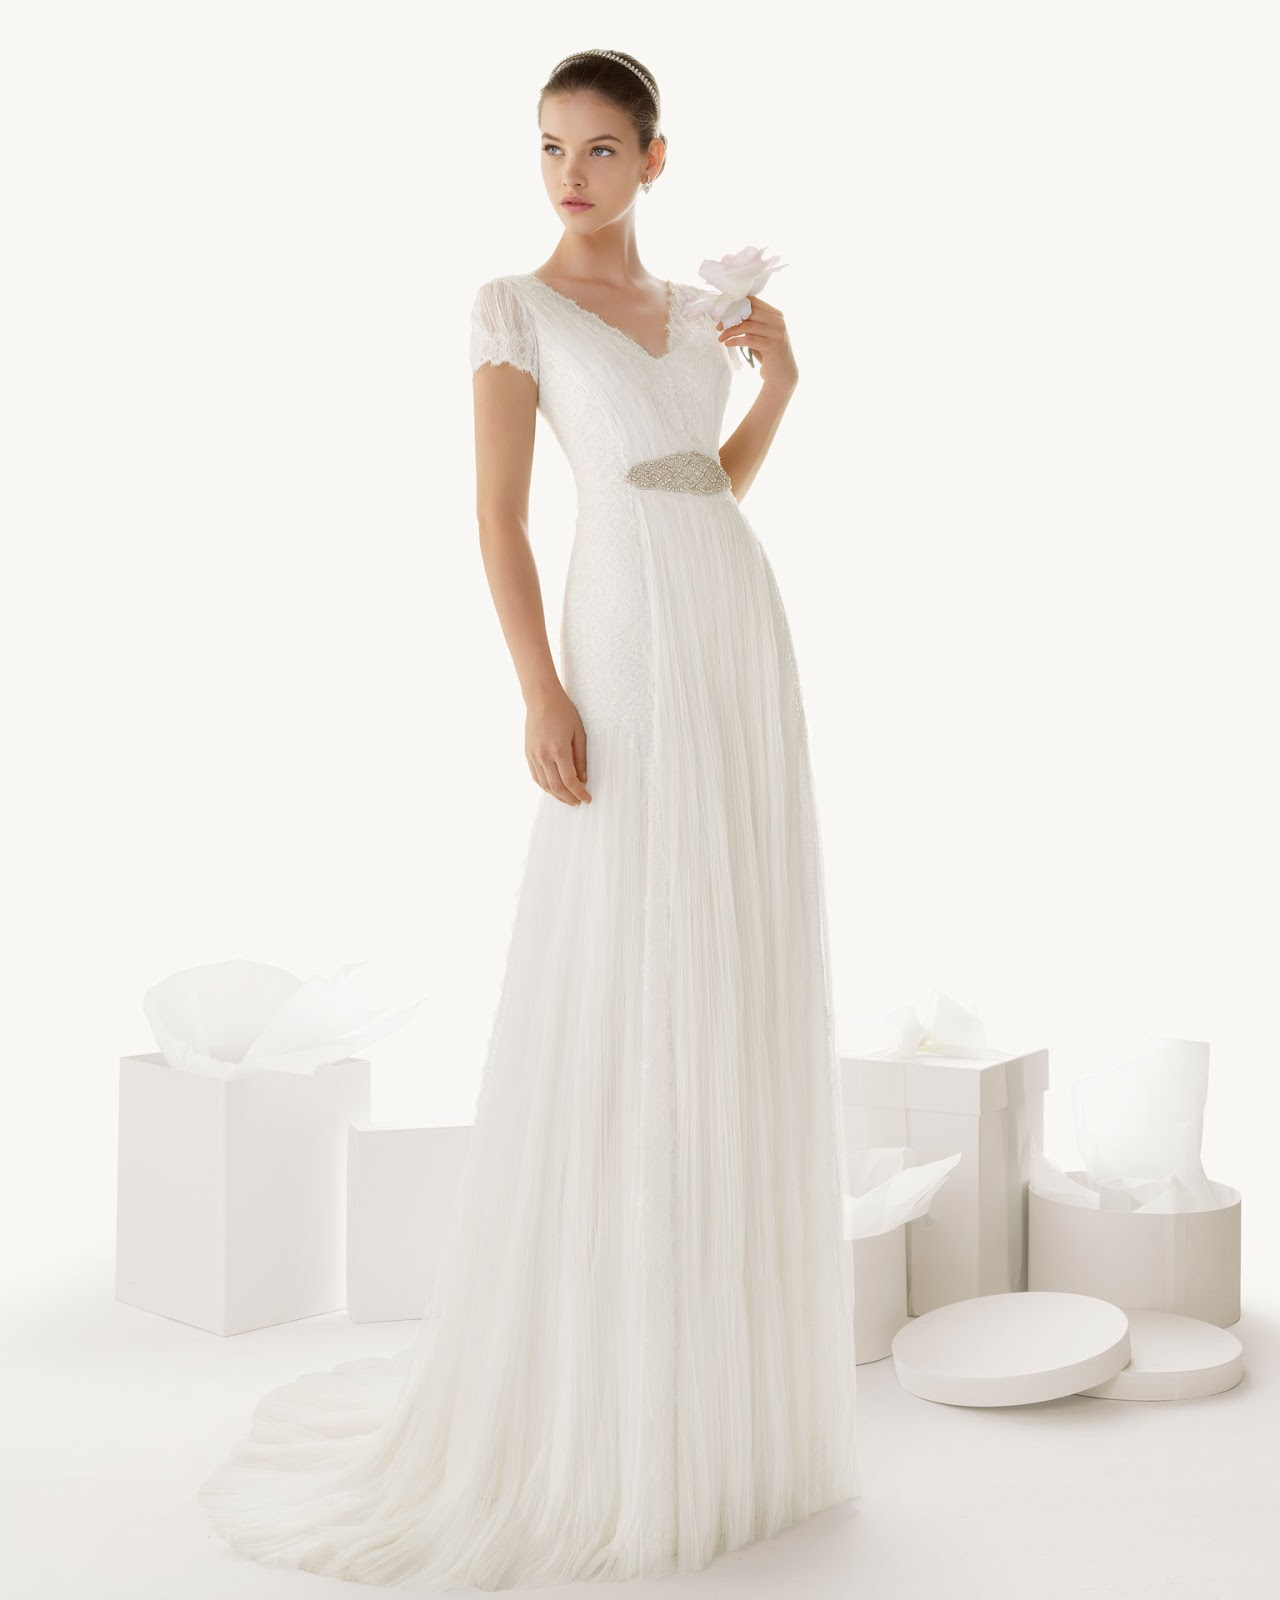 Cheap Wedding Gowns Online Blog: Spring 2013 Wedding